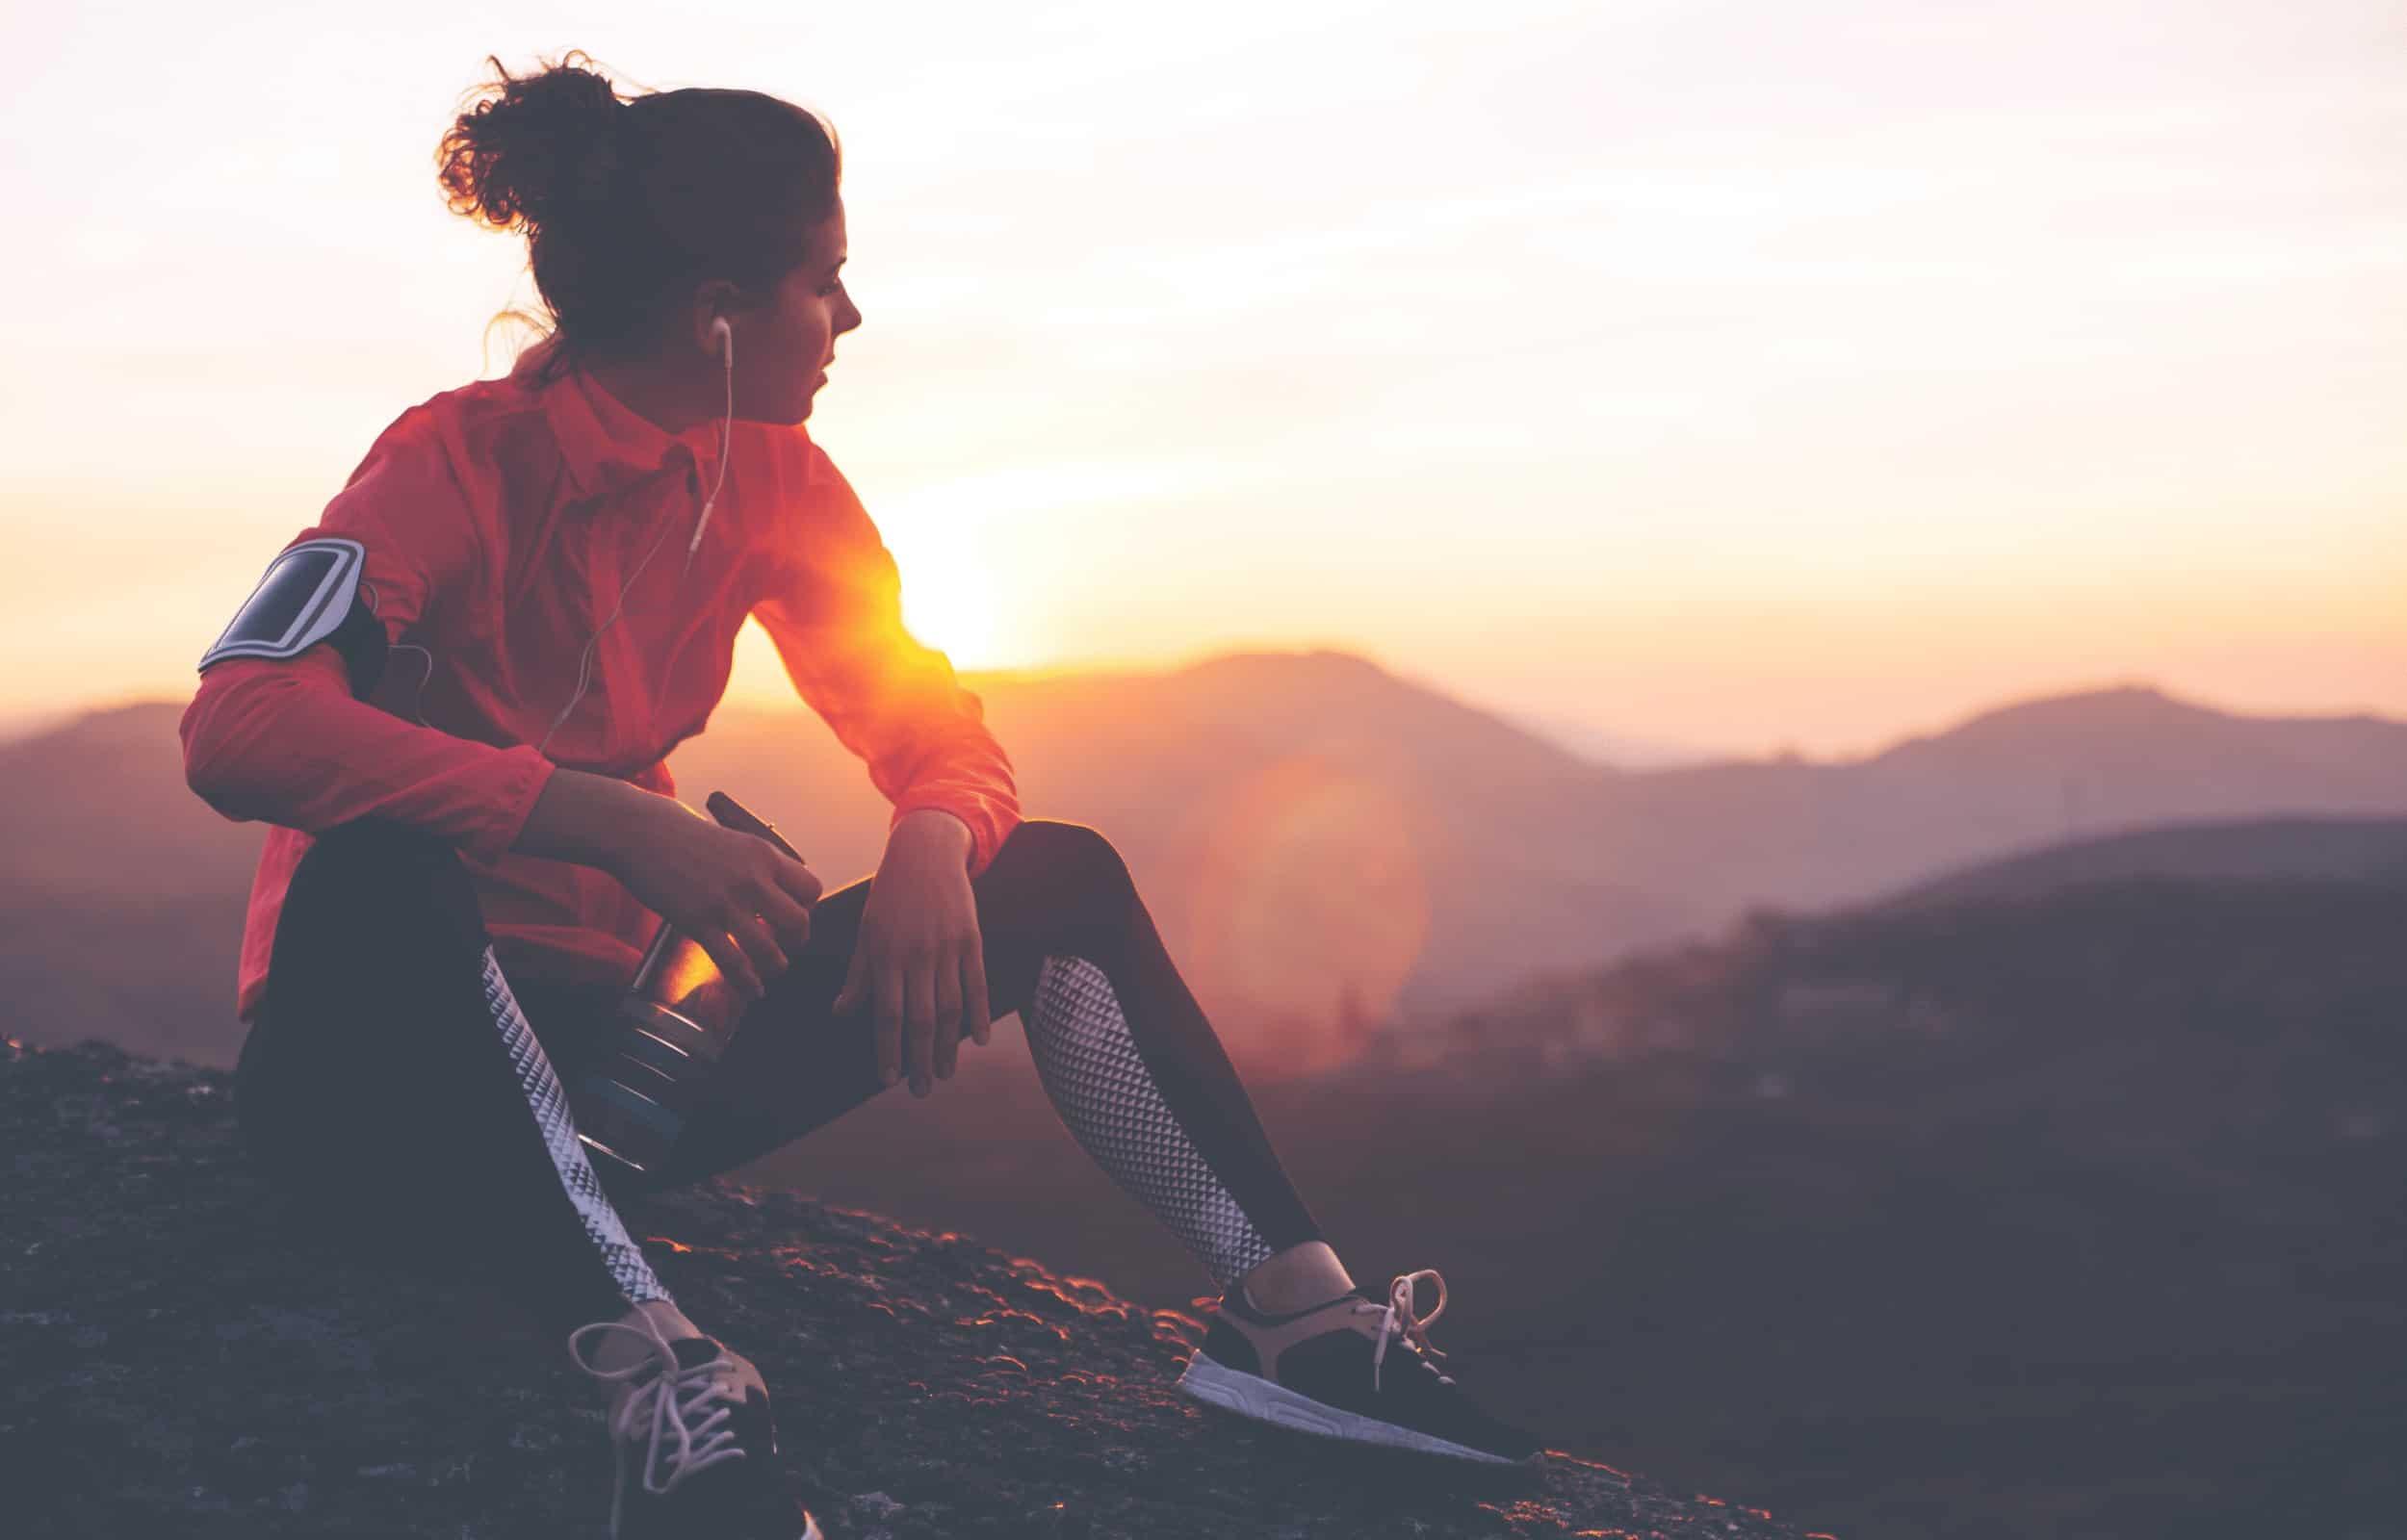 hiking alone solo hiking training girl red shirt sunrise